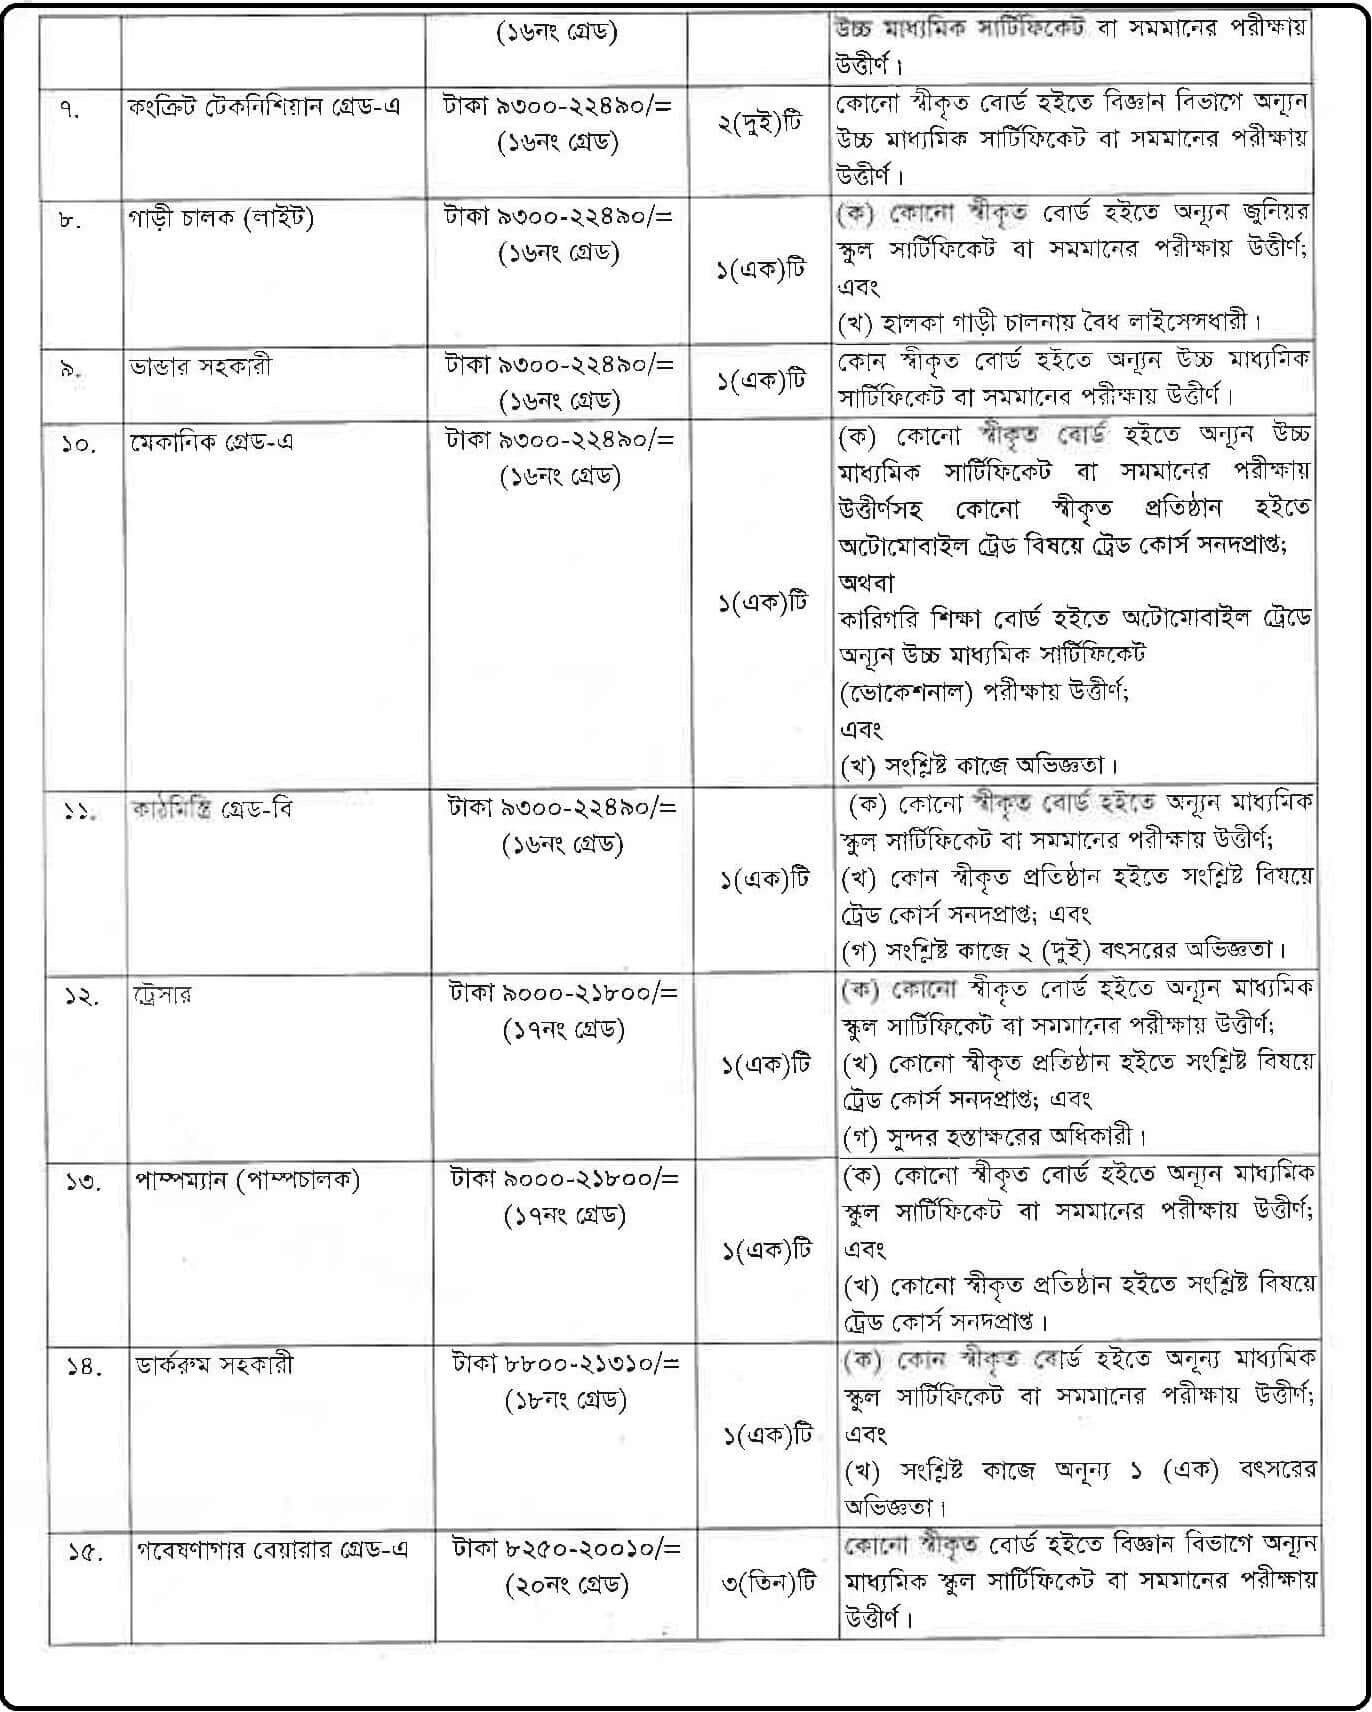 River Research Institute (RRI) Job Circular 2020